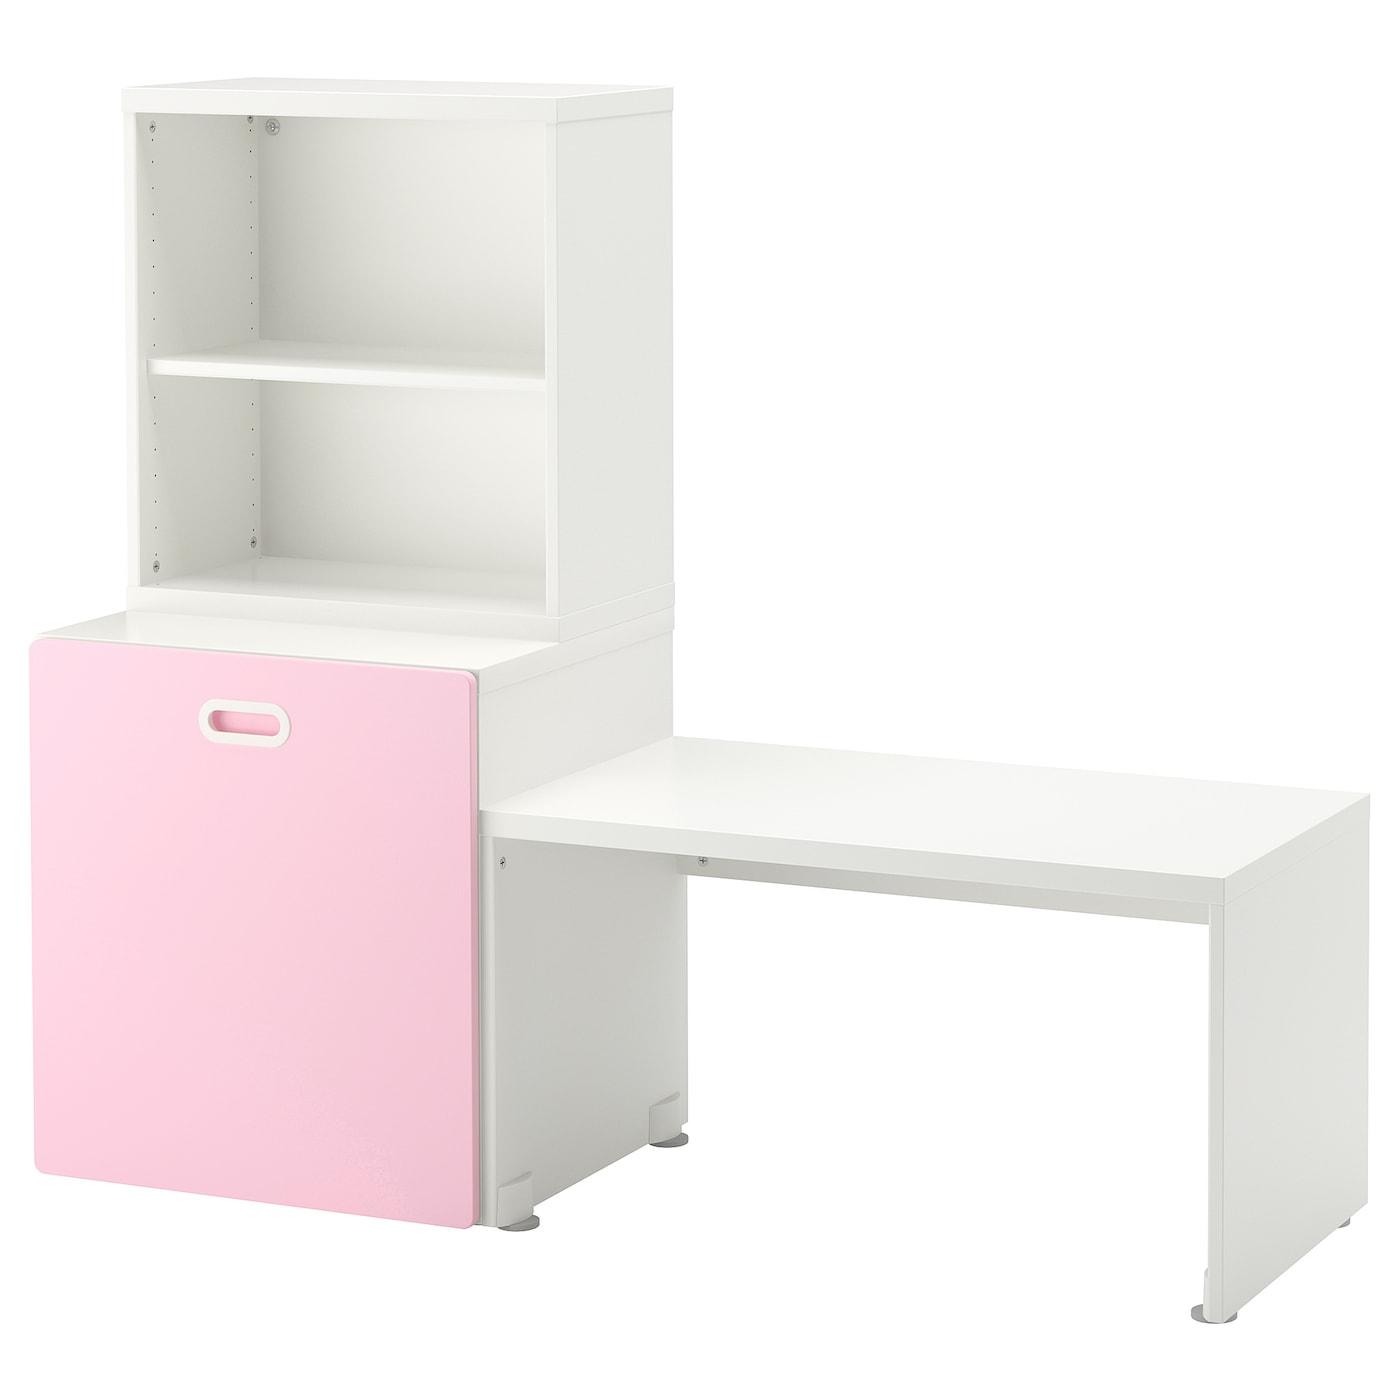 fritids stuva table avec rangement jouet blanc rose clair 150 x 50 x 128 cm ikea. Black Bedroom Furniture Sets. Home Design Ideas